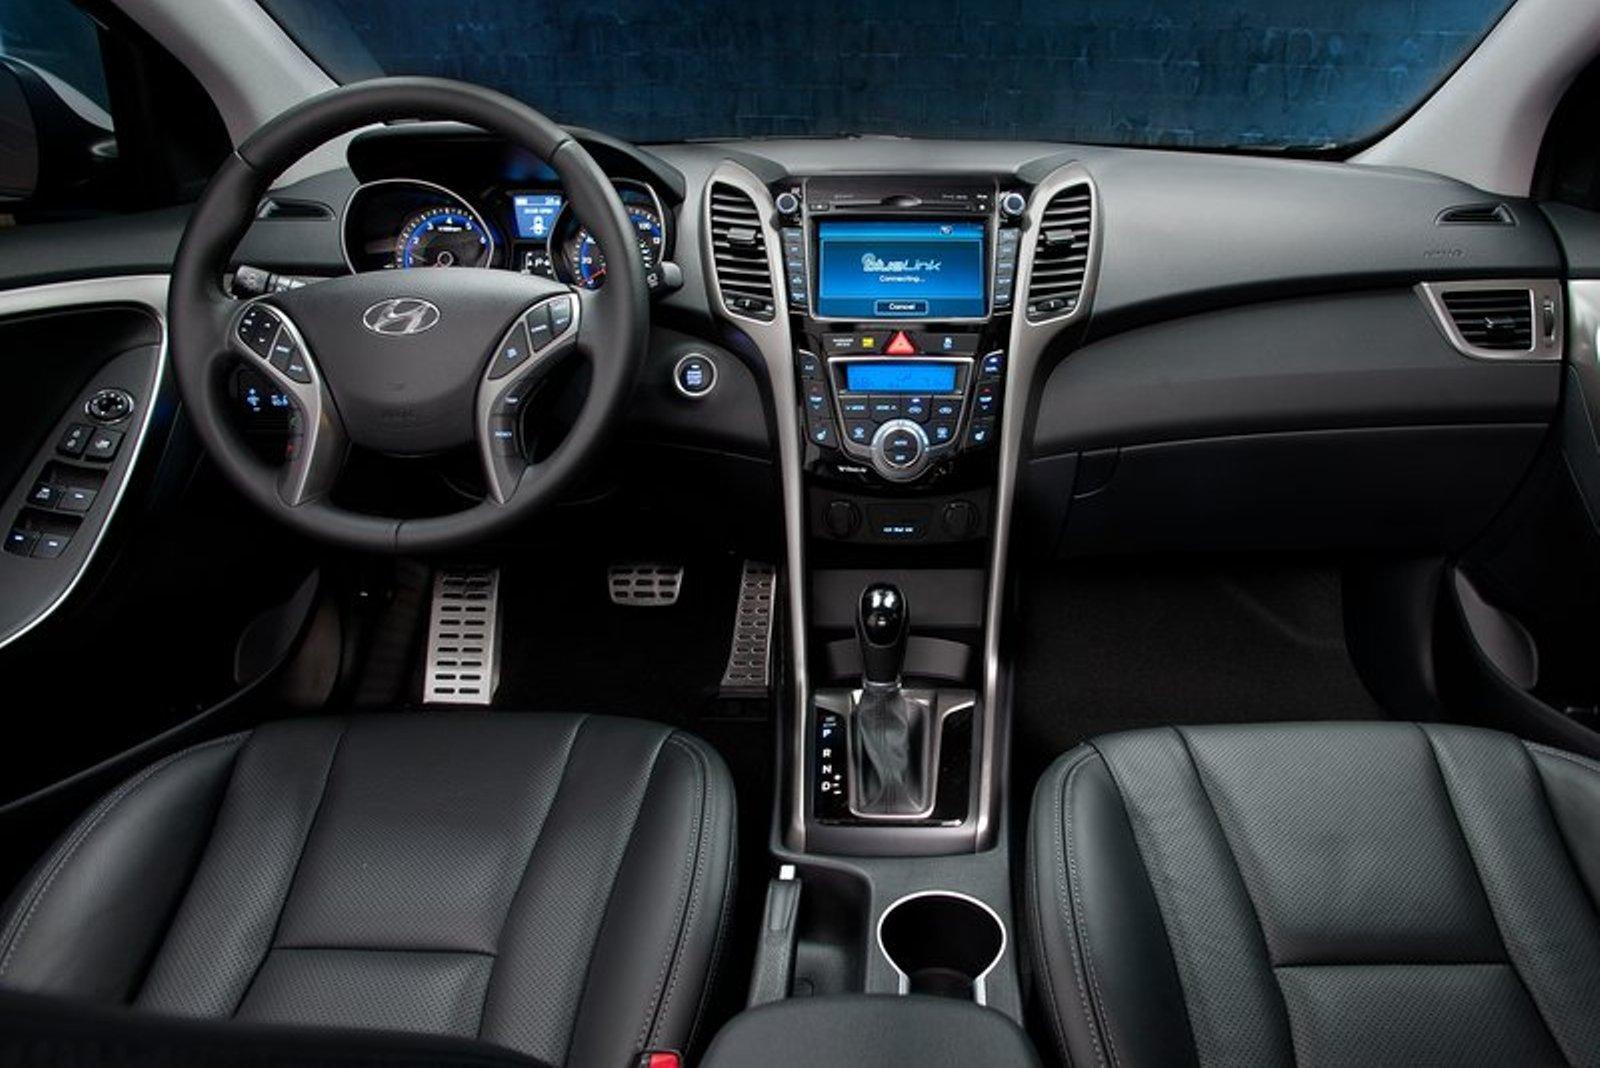 2014 Hyundai Elantra Review Price Release